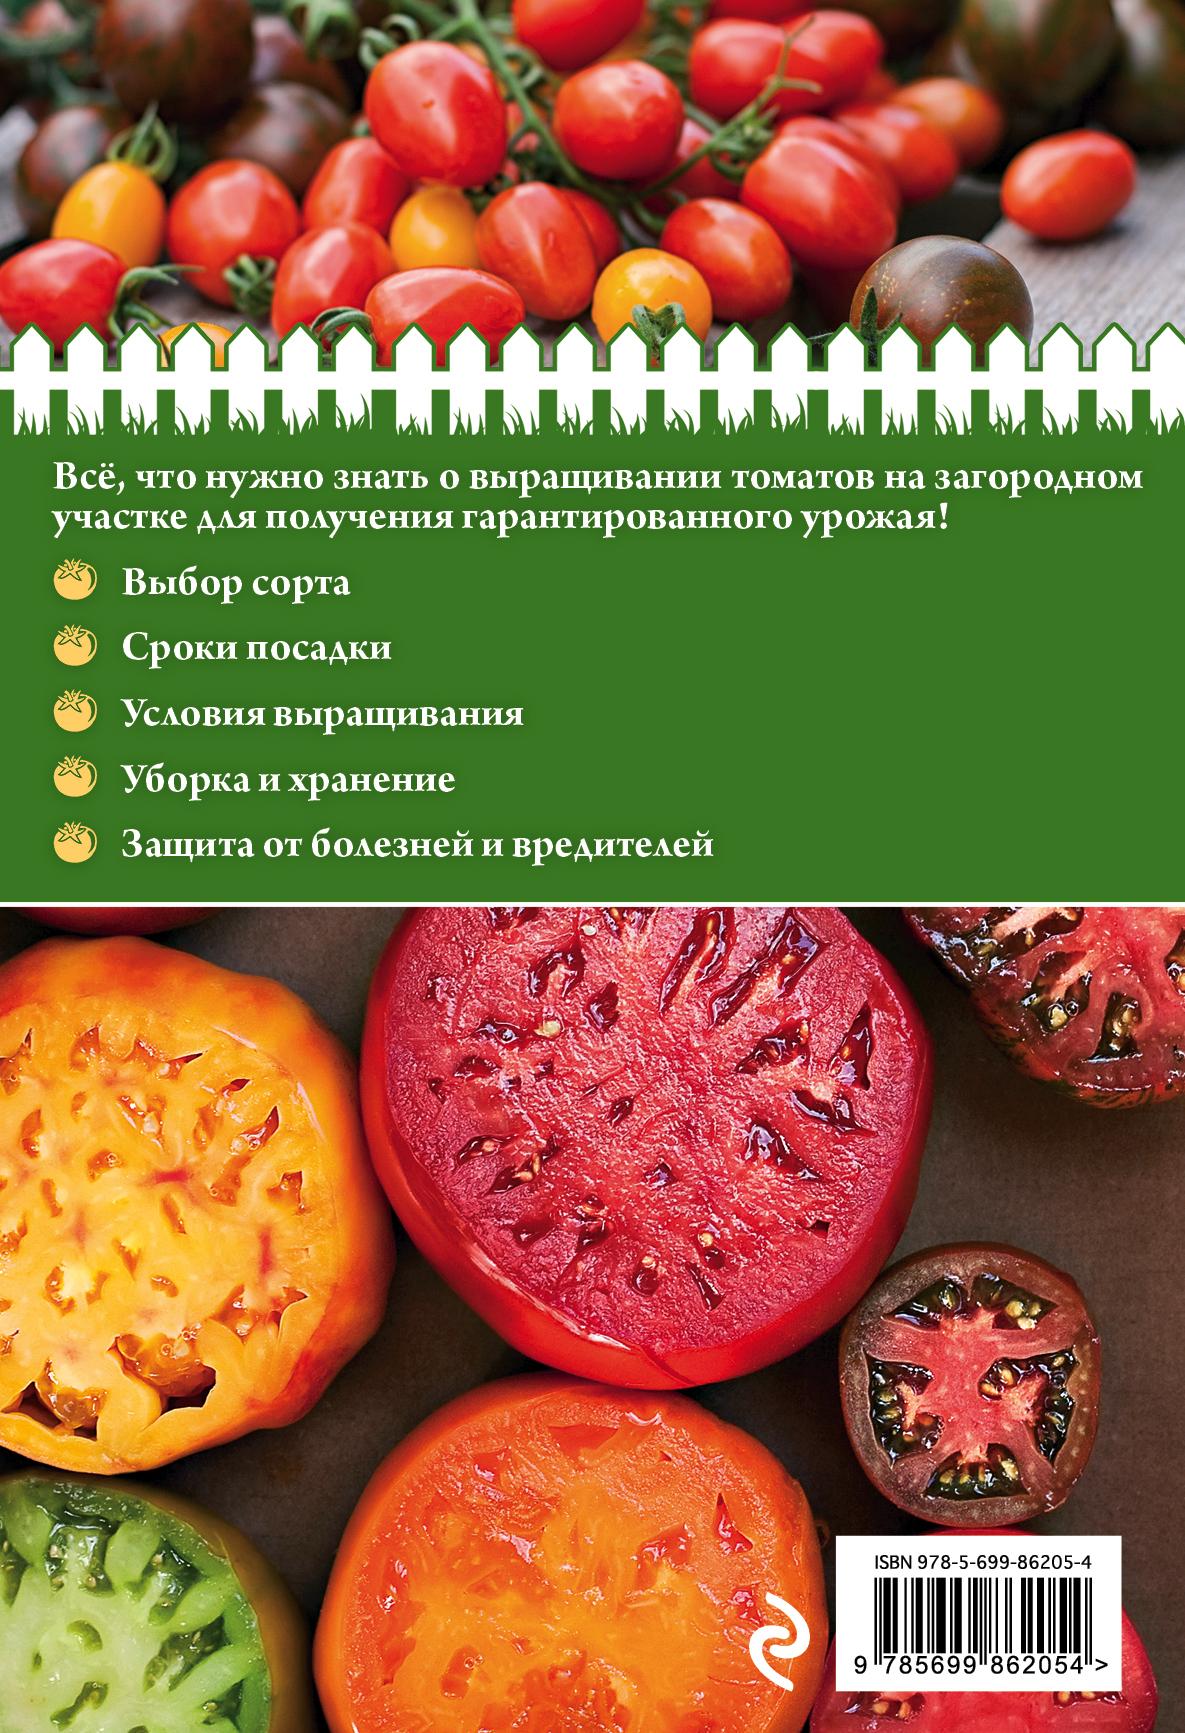 От рассады до урожая томаты 683